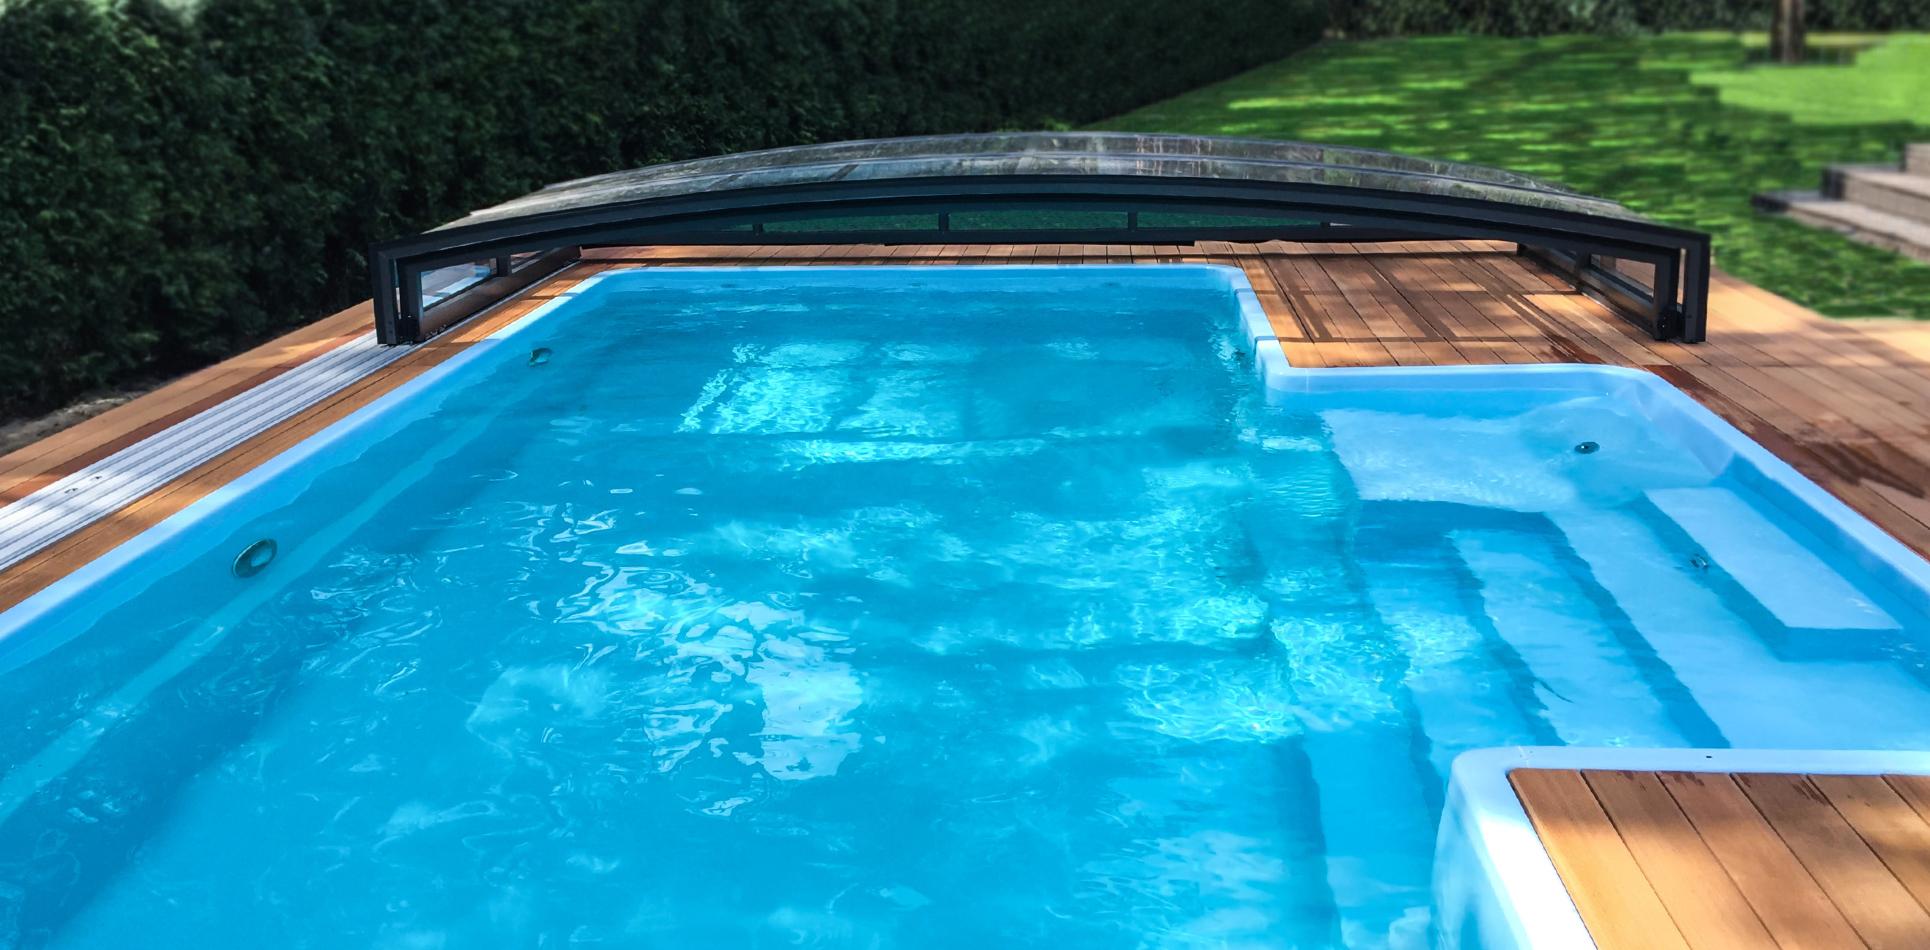 Gfk Pool Gfk Schwimmbecken Gartenpool Pool Kaufen